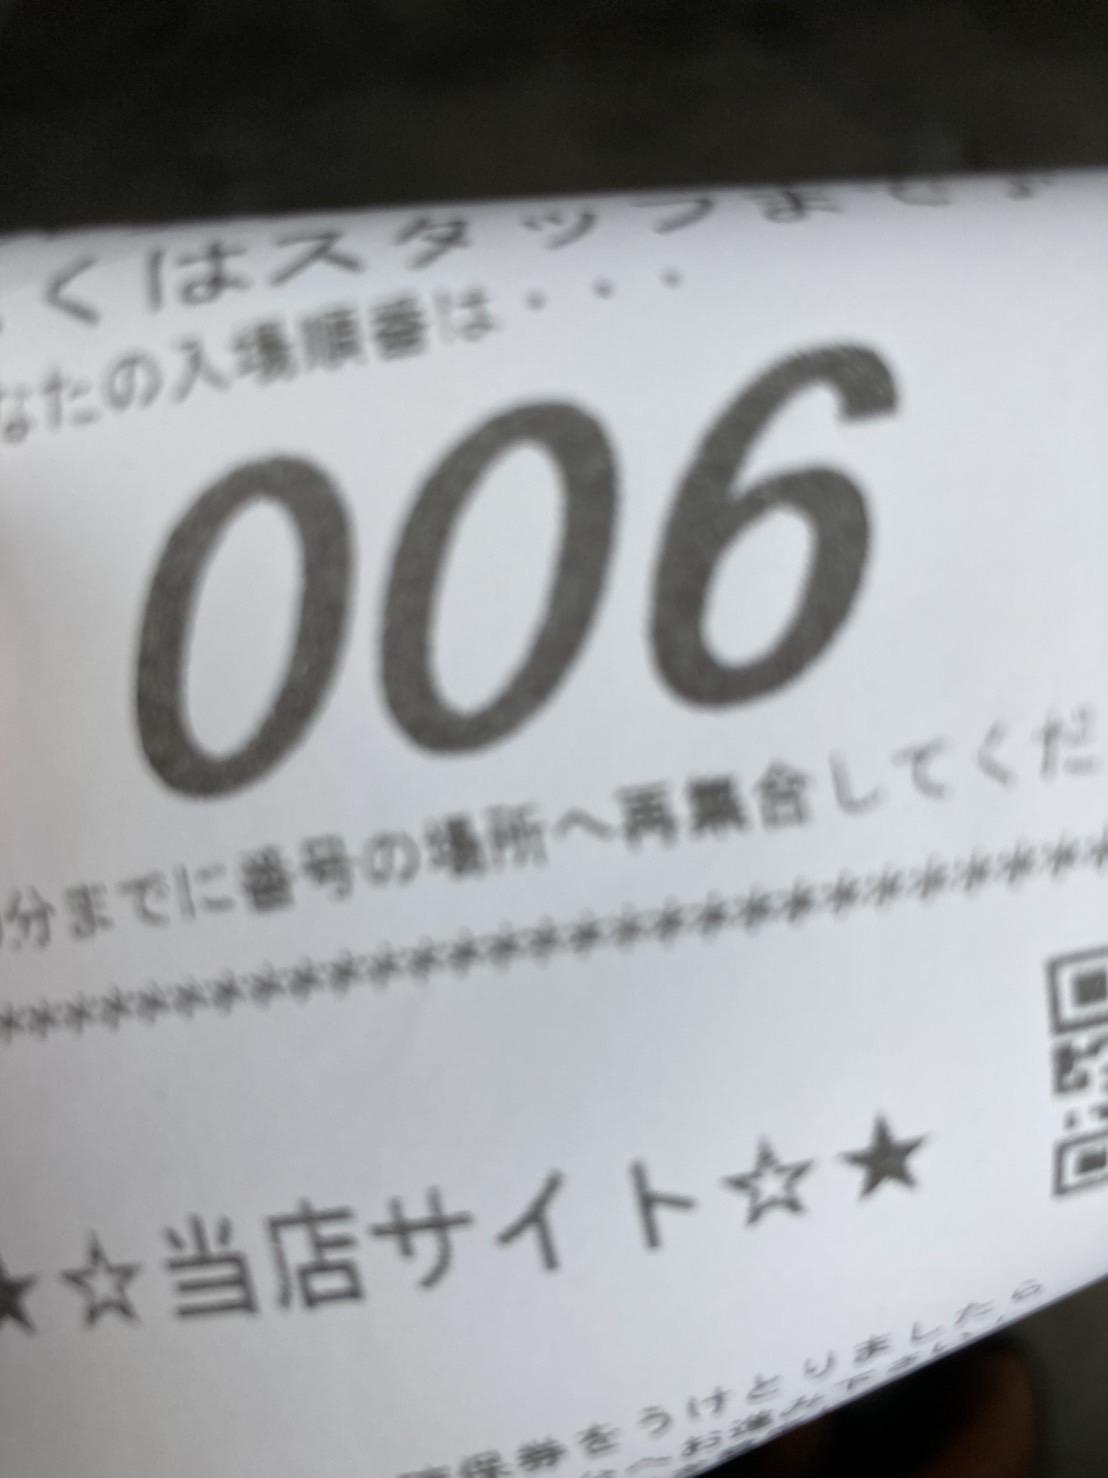 cb53e669f179daf997c1dc4762e229c41c155fc5